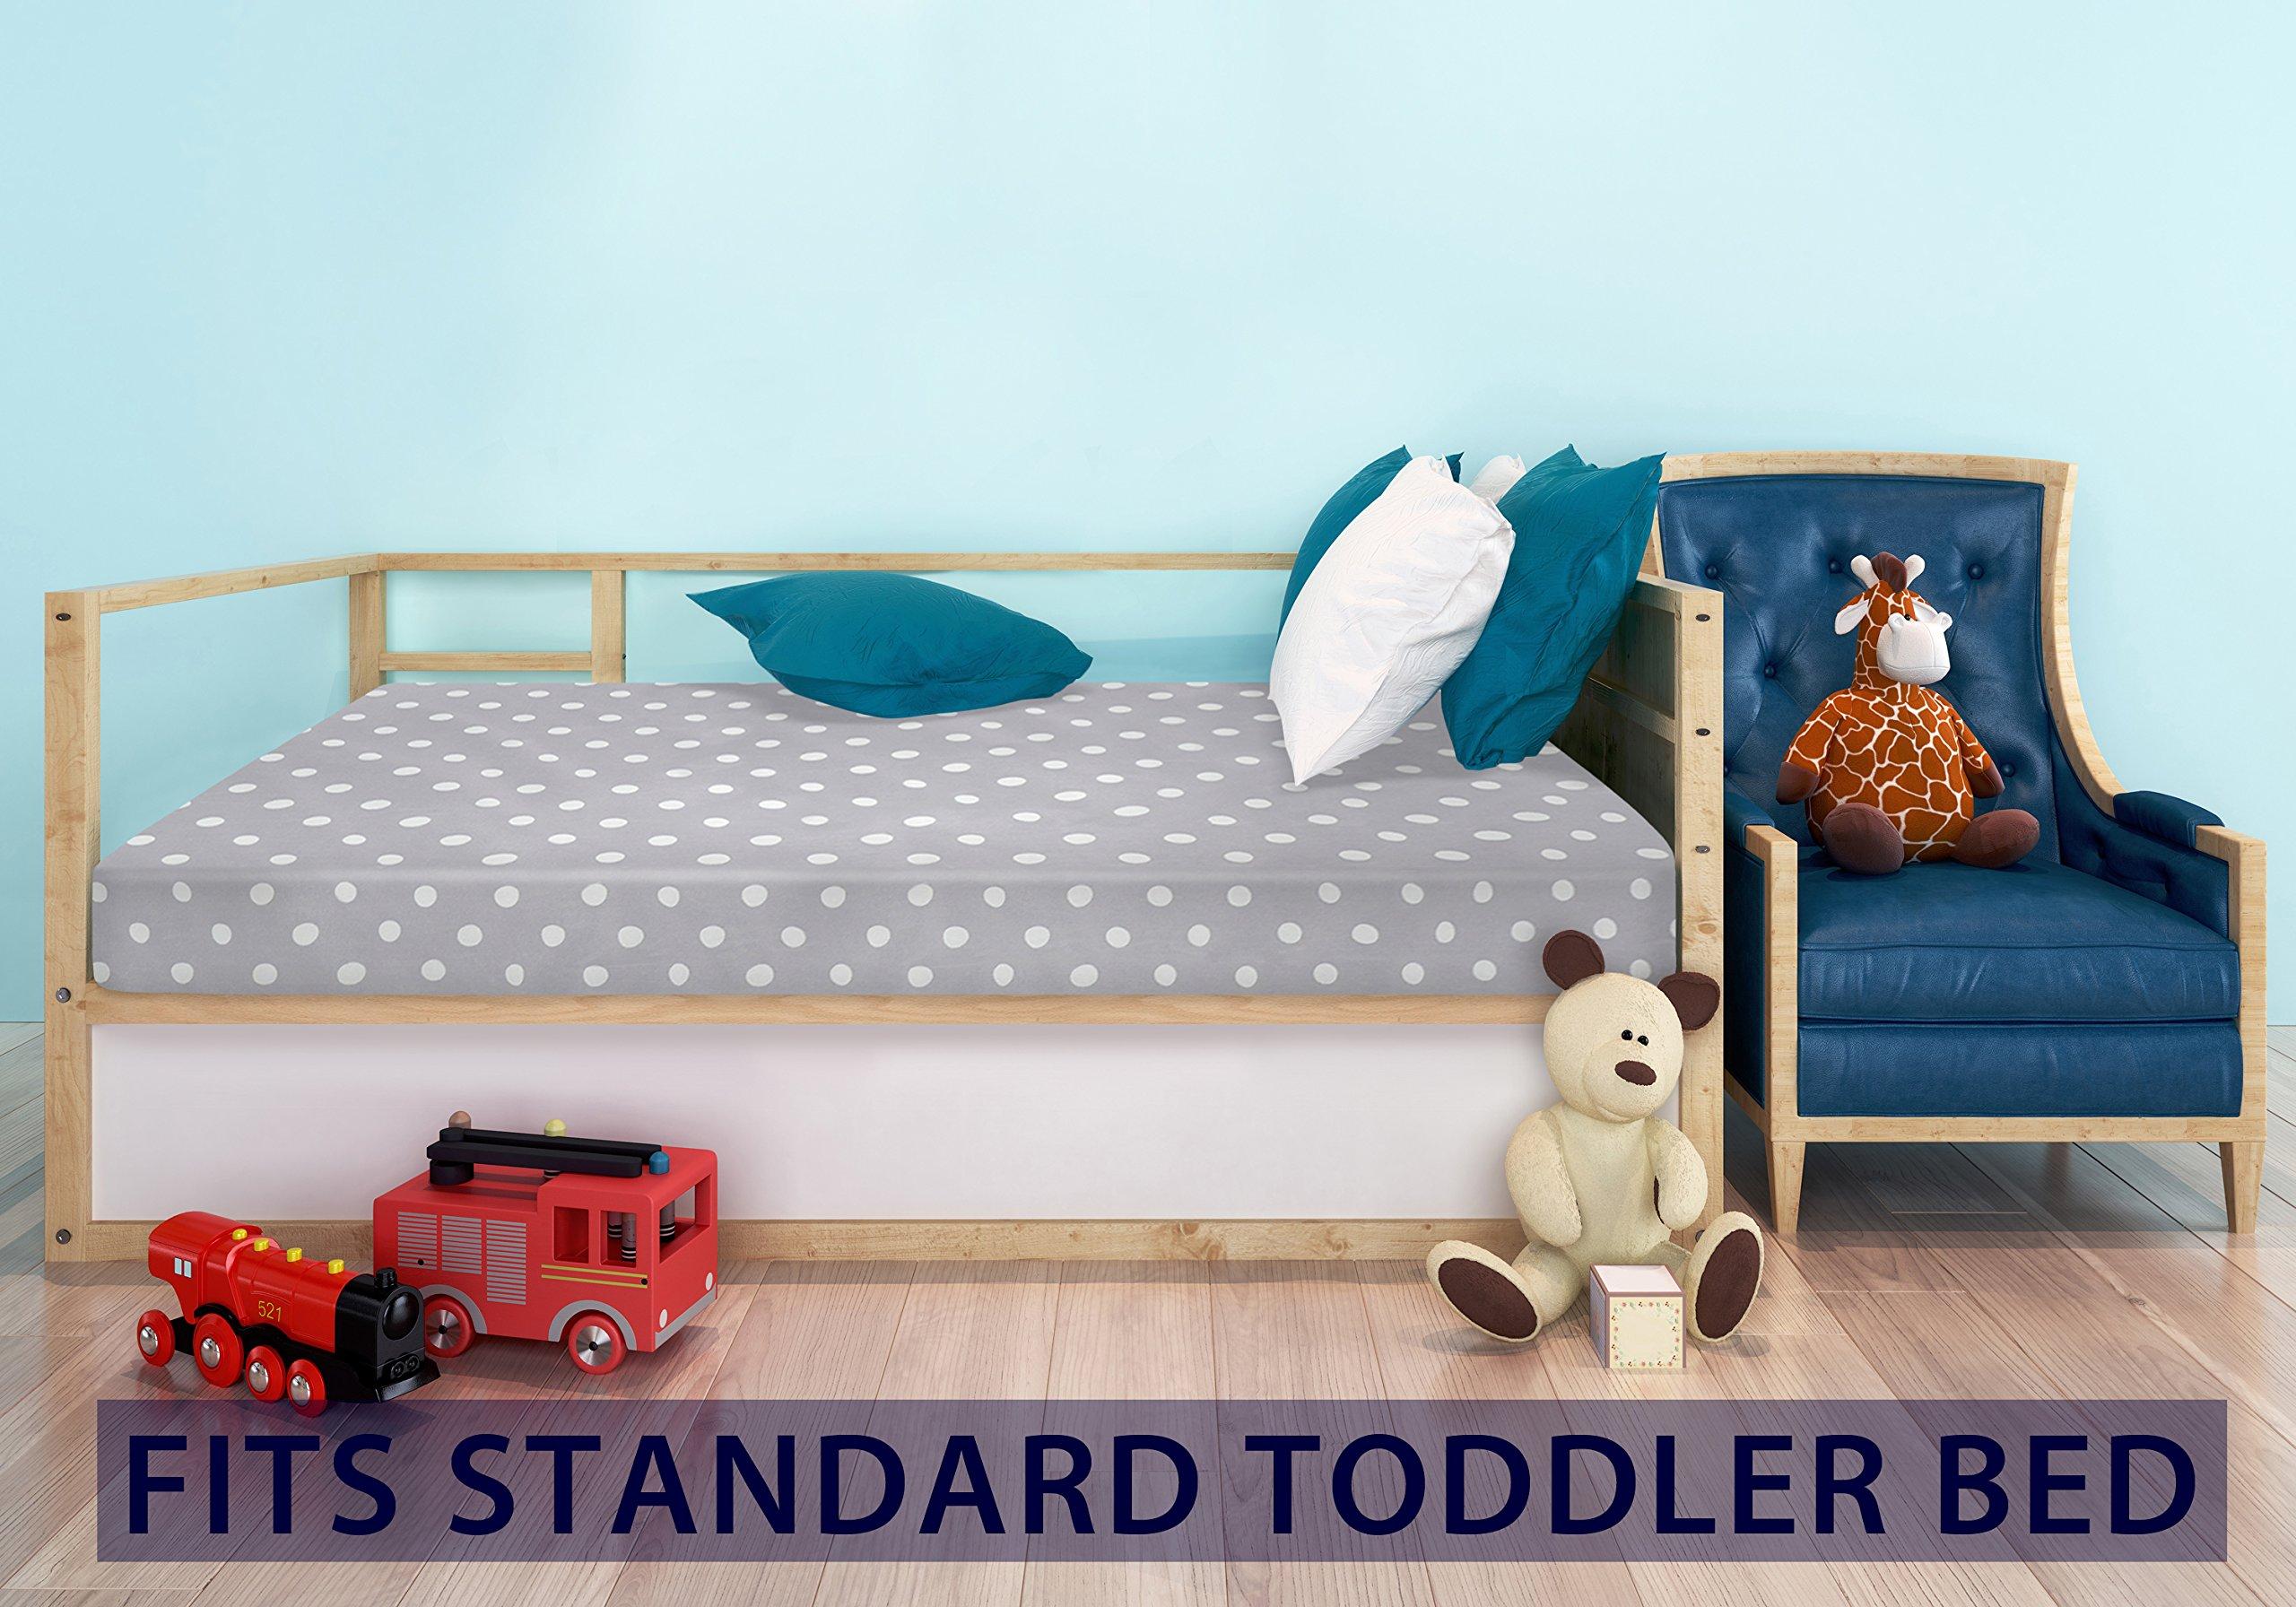 Milliard Crib Mattress and Toddler Bed Mattress | Hypoallergenic + Waterproof Encasement | 27.5''x52''x5'' by Milliard (Image #6)